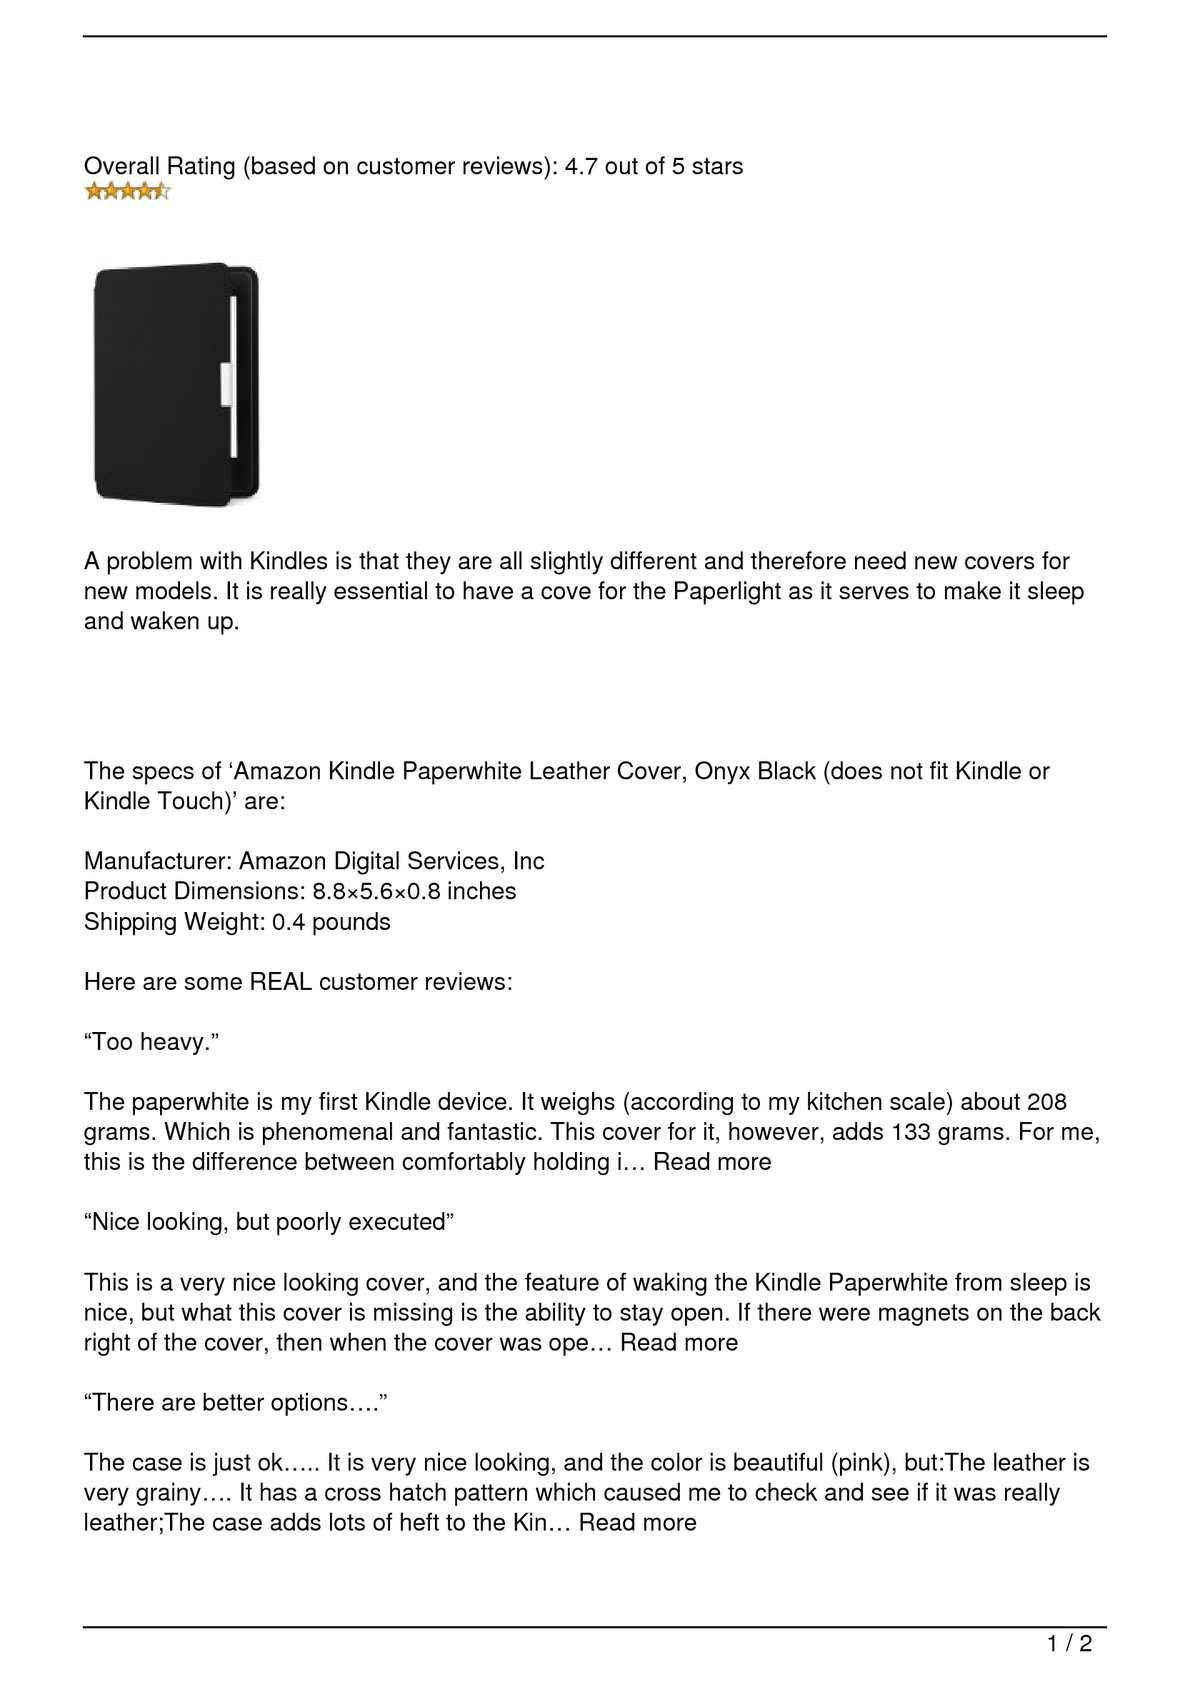 Calaméo - Amazon Kindle Paperwhite Leather Cover, Onyx Black